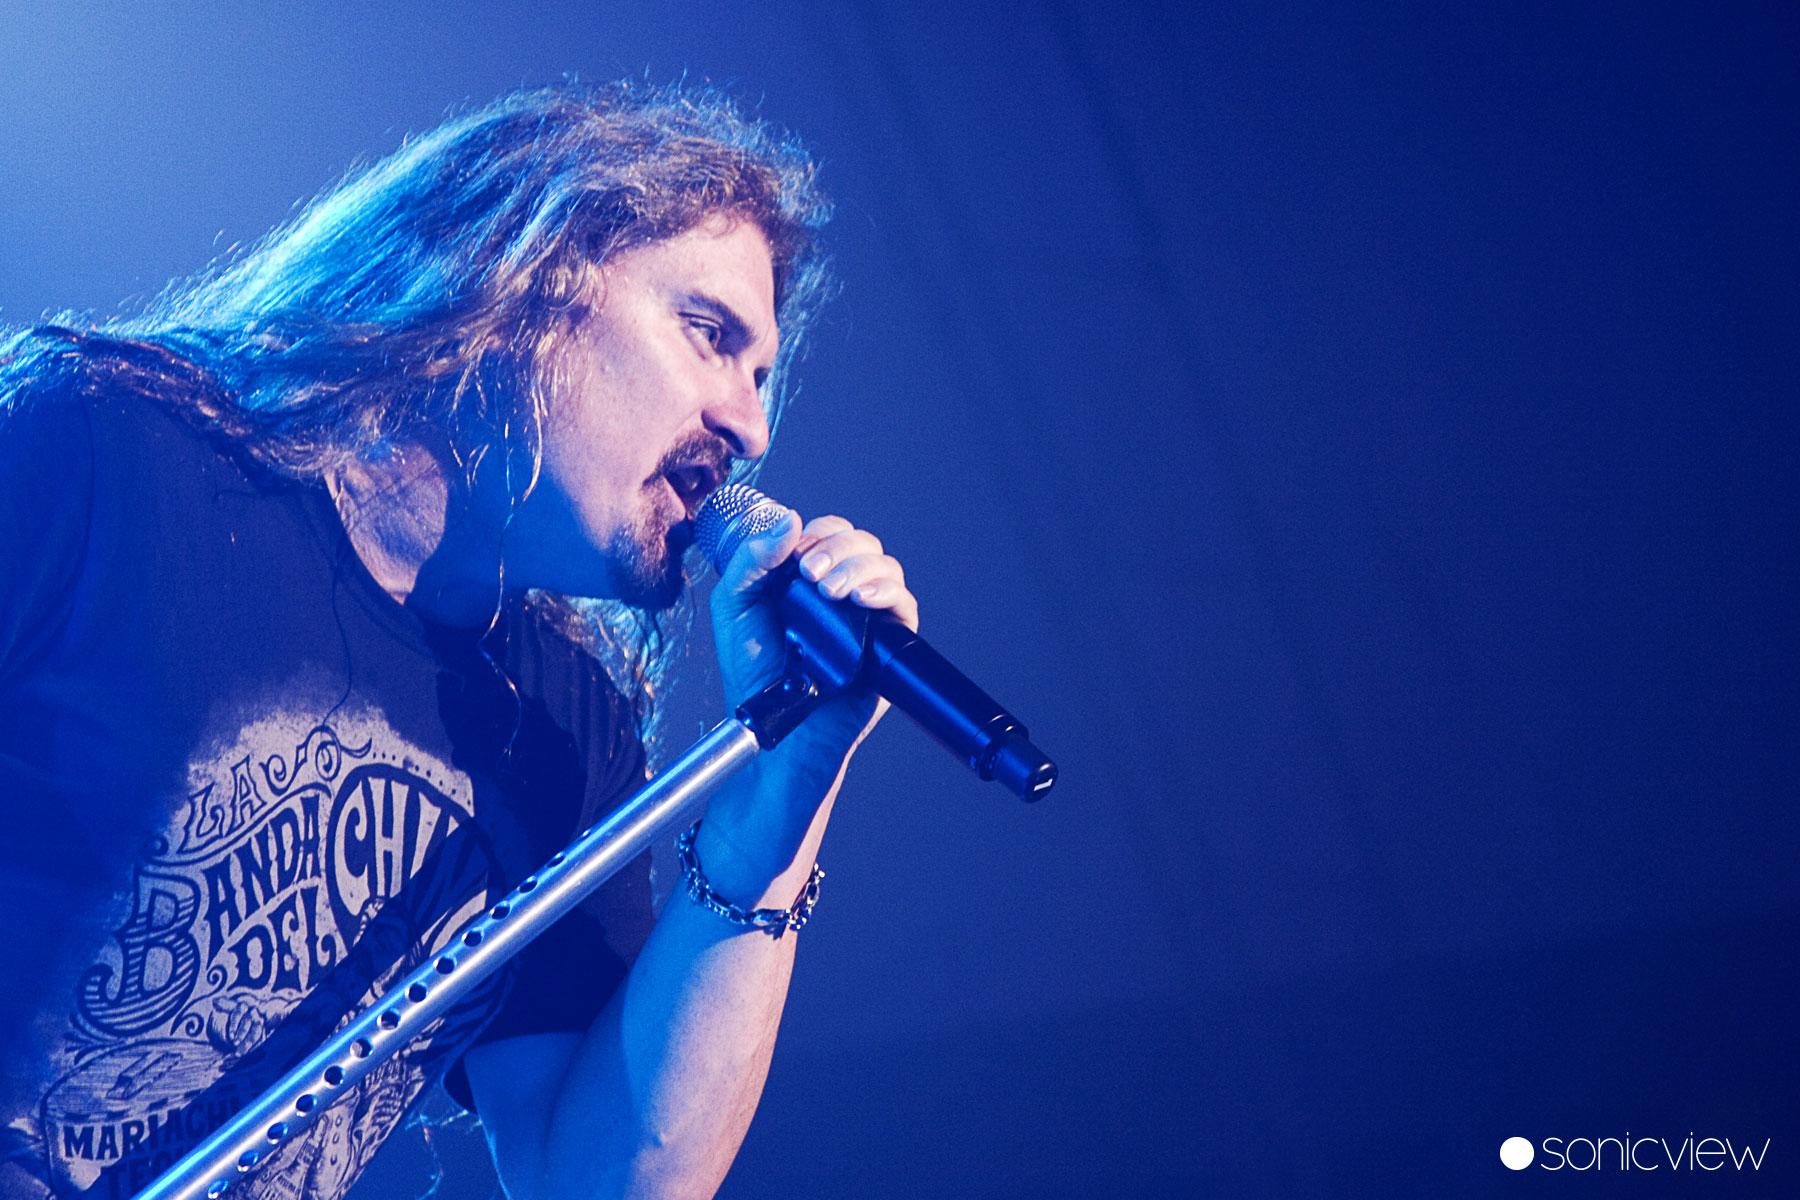 Dream Theater: Live at KB Hallen 2009, Copenhagen, Denmark